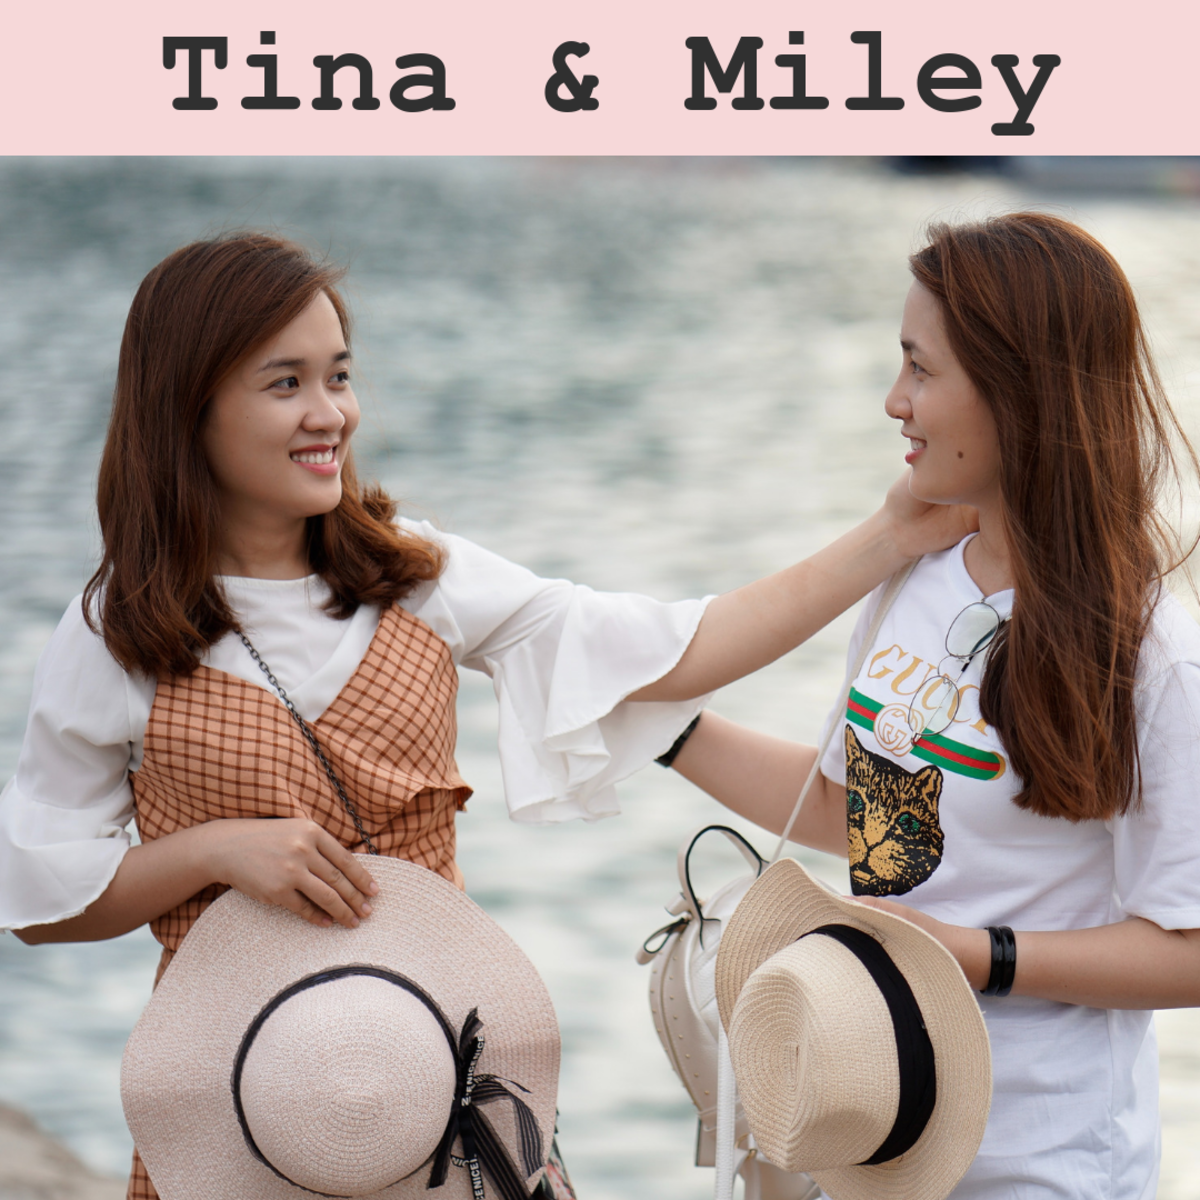 Tina and Miley